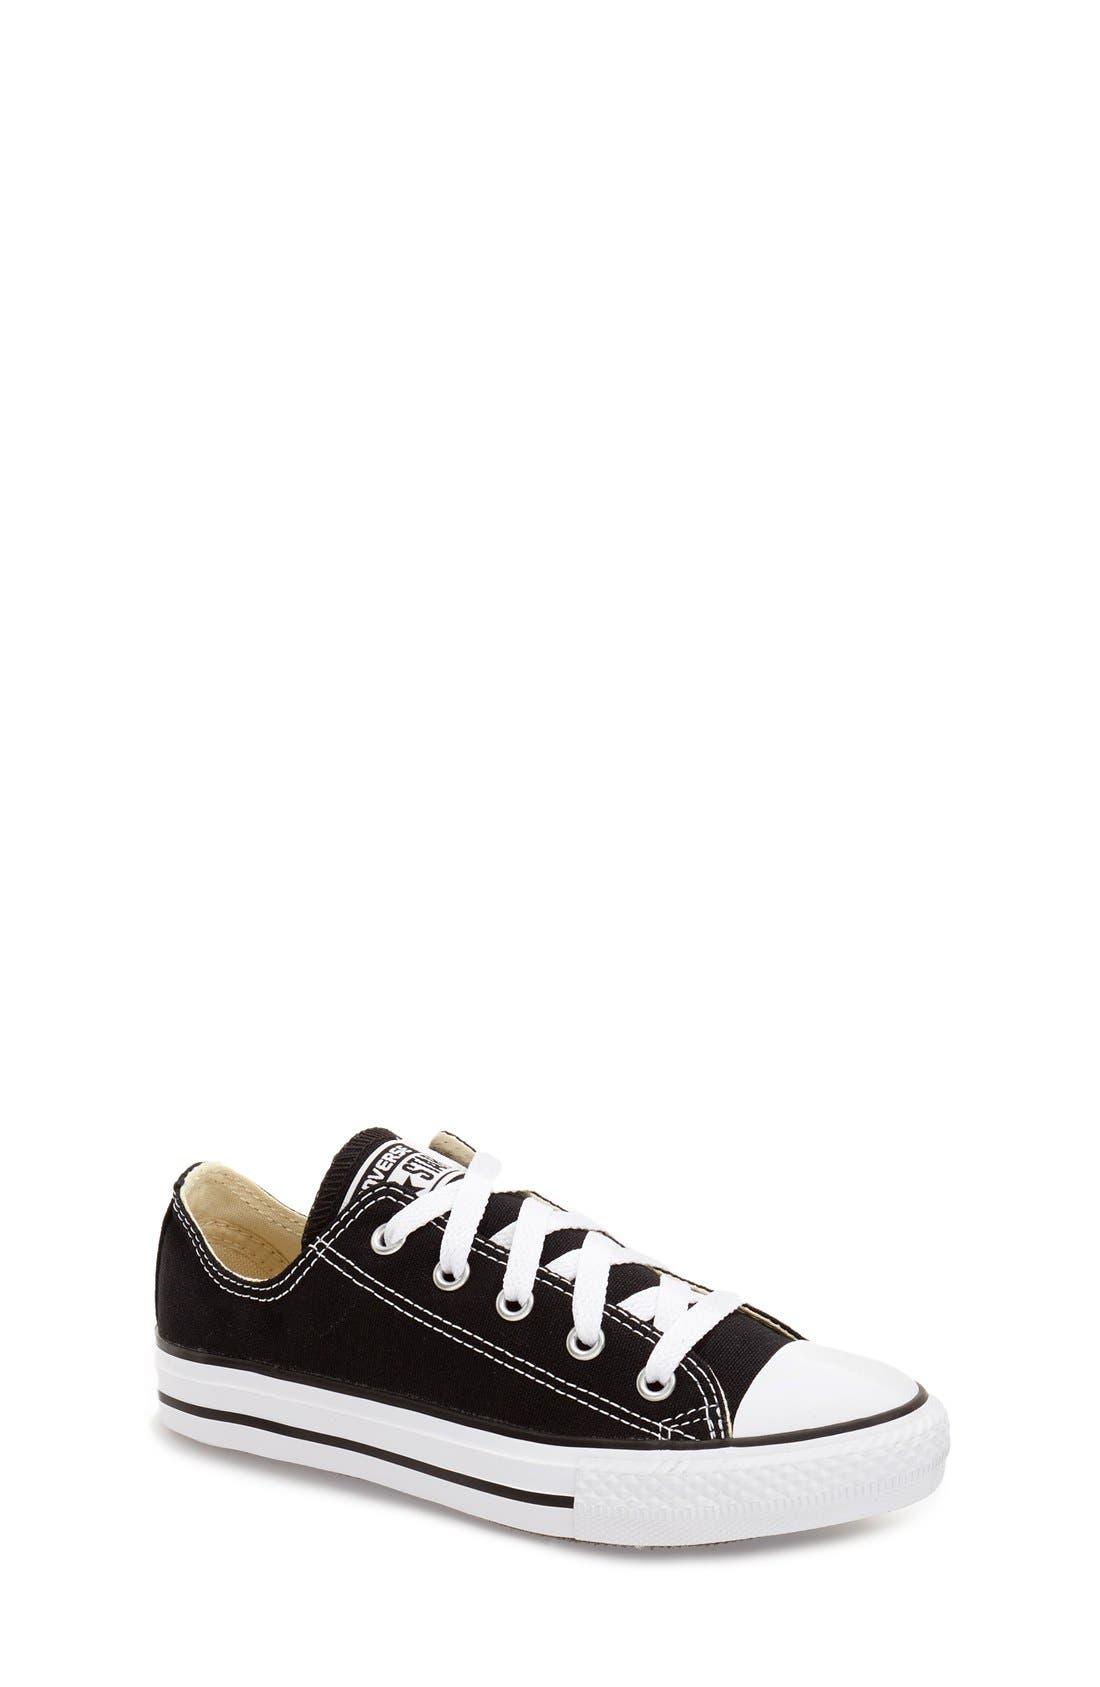 Main Image - Converse Chuck Taylor® Sneaker (Toddler, Little Kid & Big Kid)